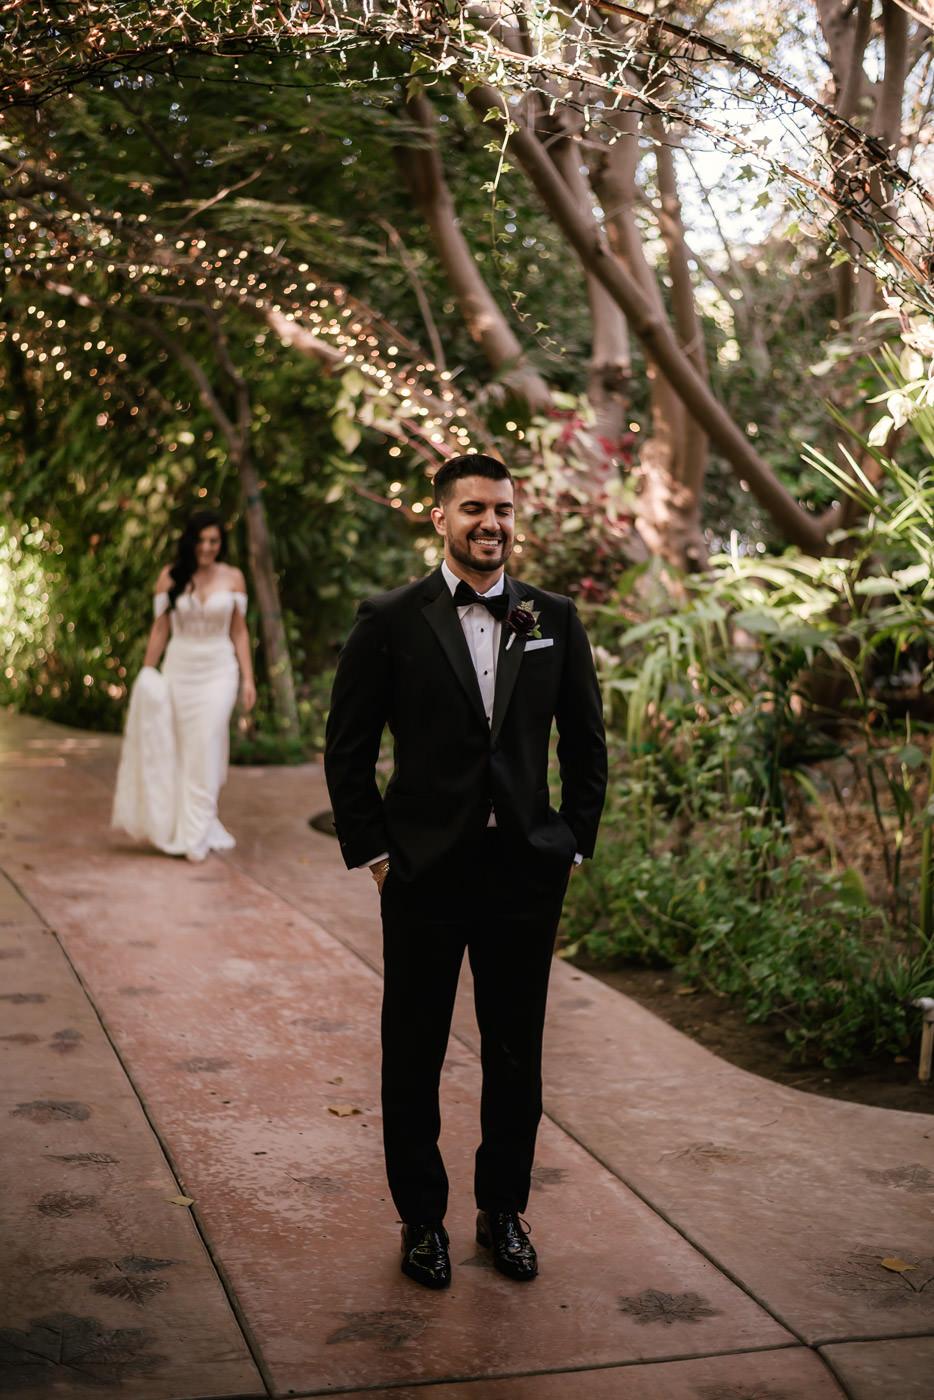 eden-gardens-wedding-photographer-romantic-22.jpg